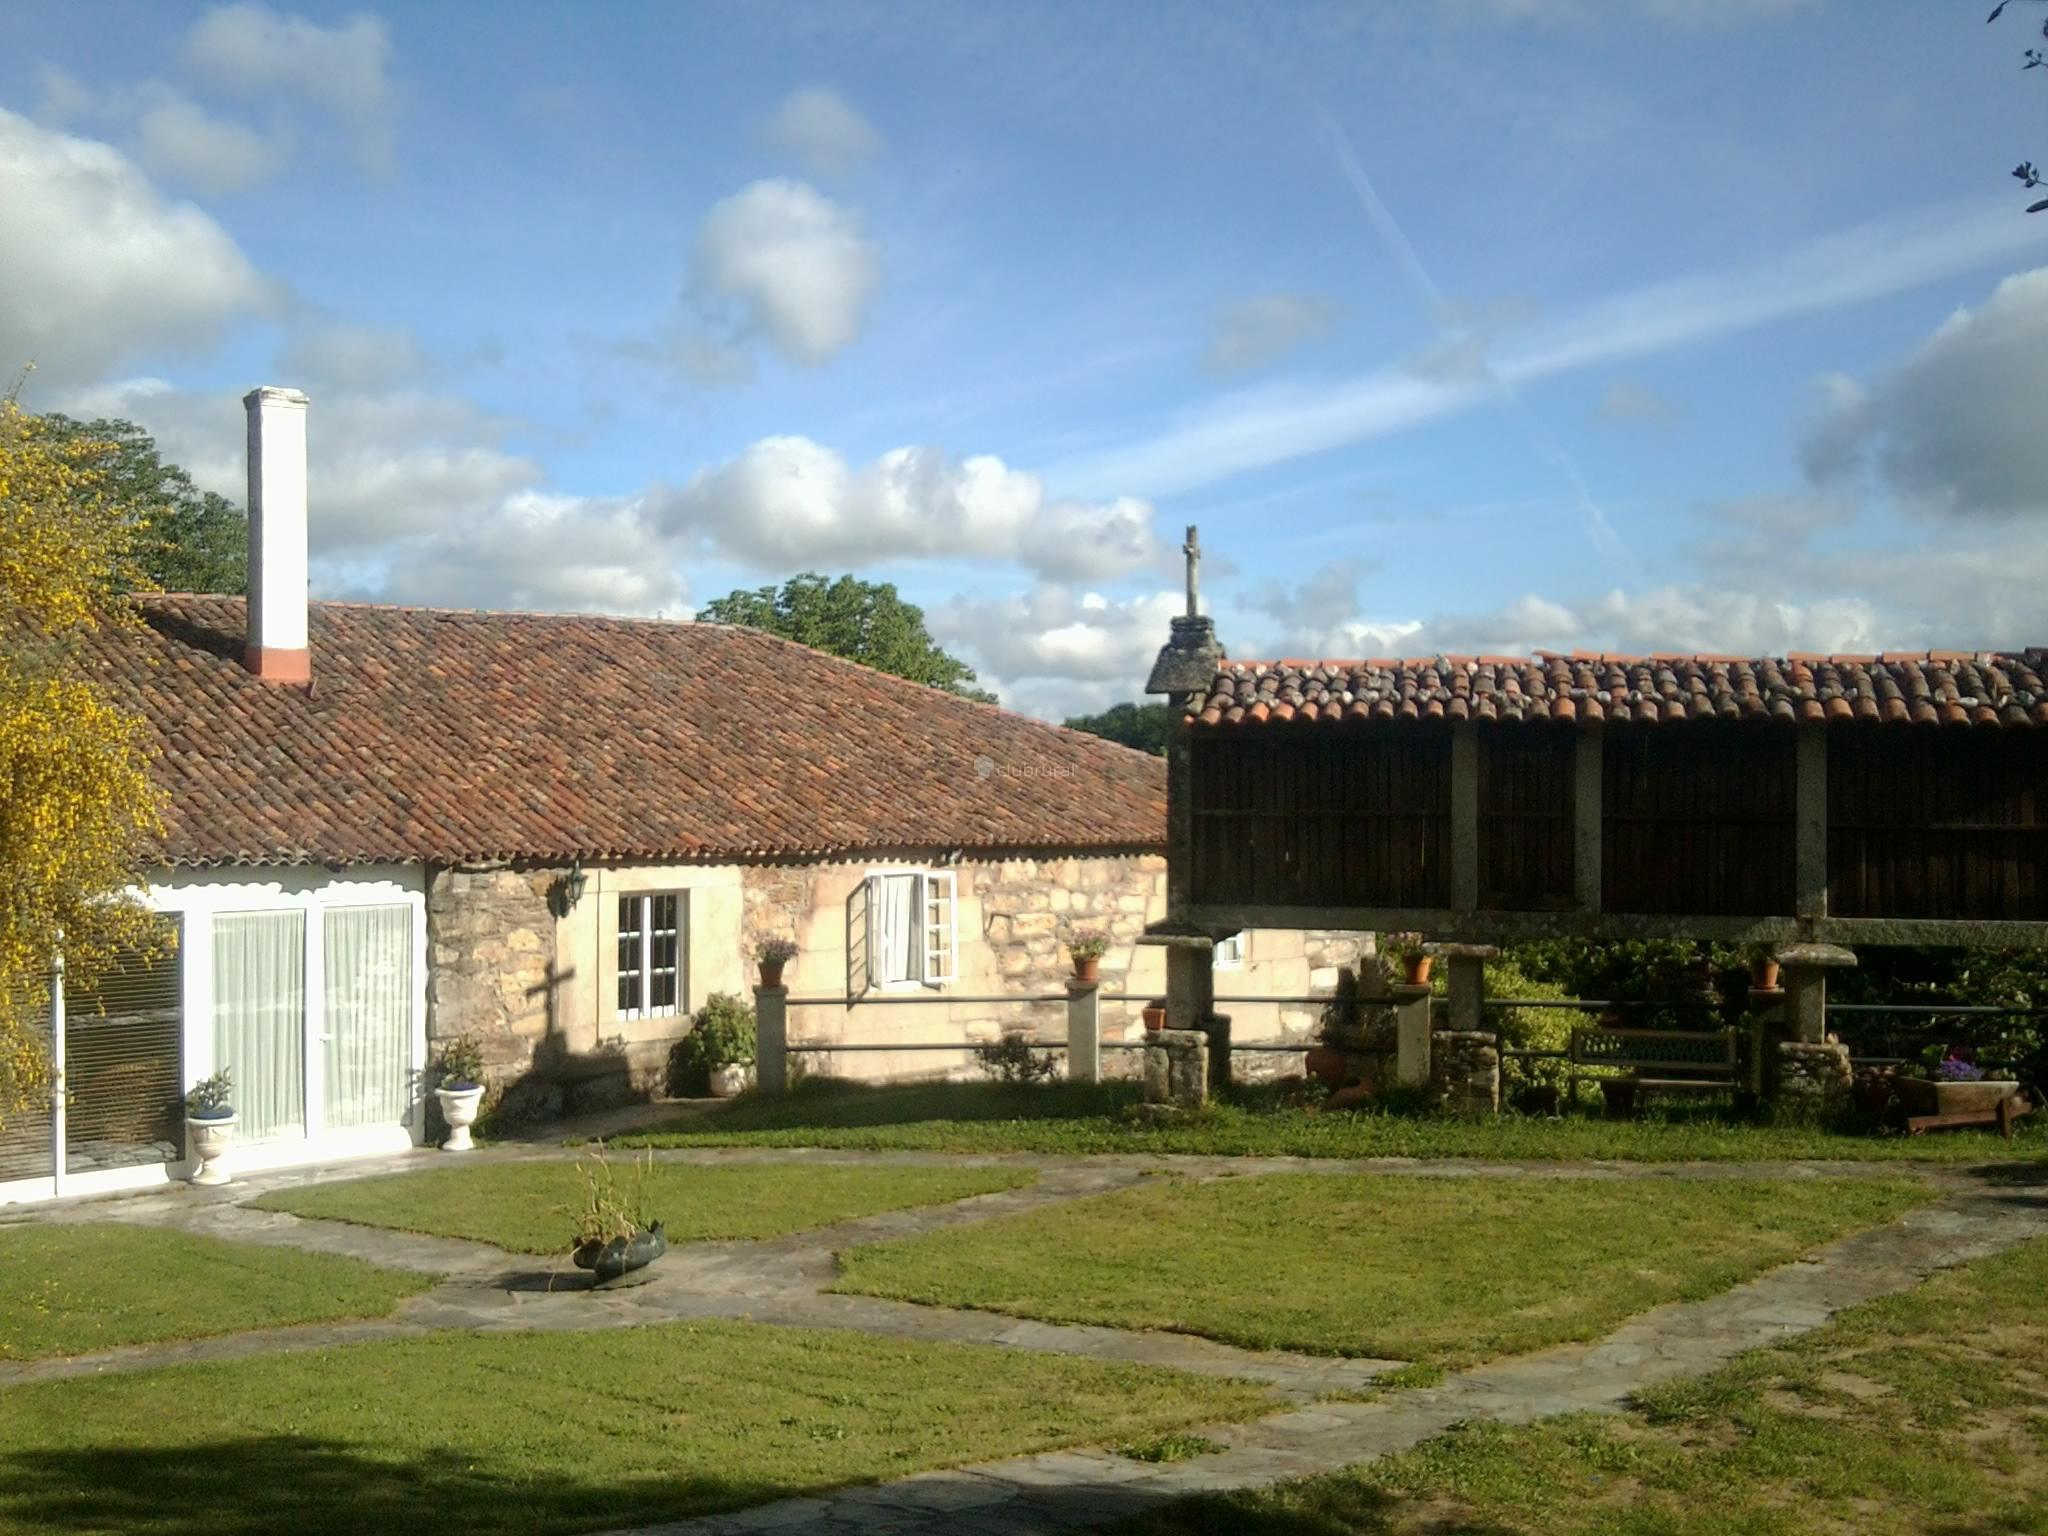 Fotos de casa vixide pontevedra lalin clubrural - Casa rural silleda ...